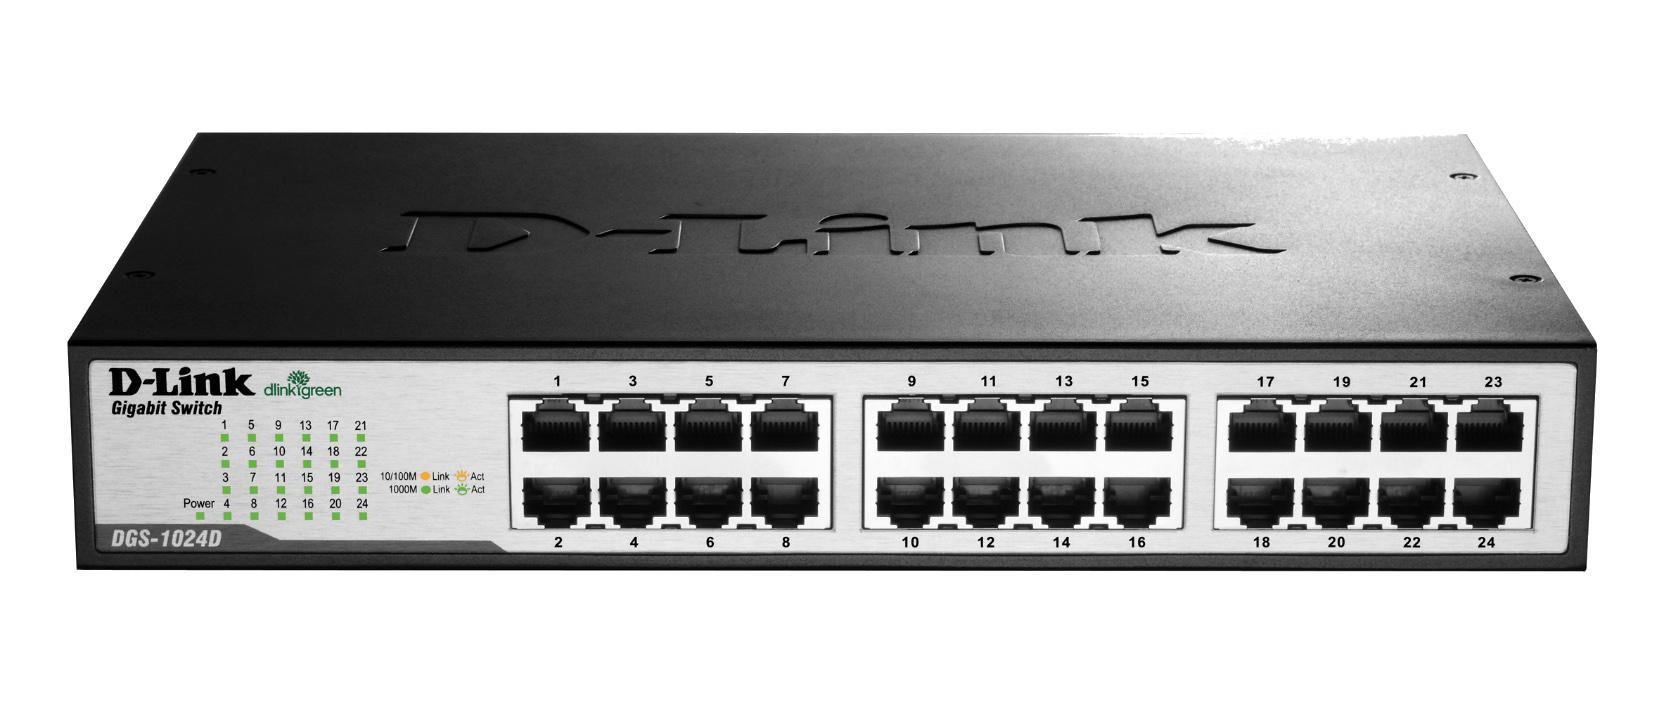 D-Link DGS 1024D - Switch - Kupferdraht 1.000 Mbps - 24-Port 3 HE - Rack-Modul